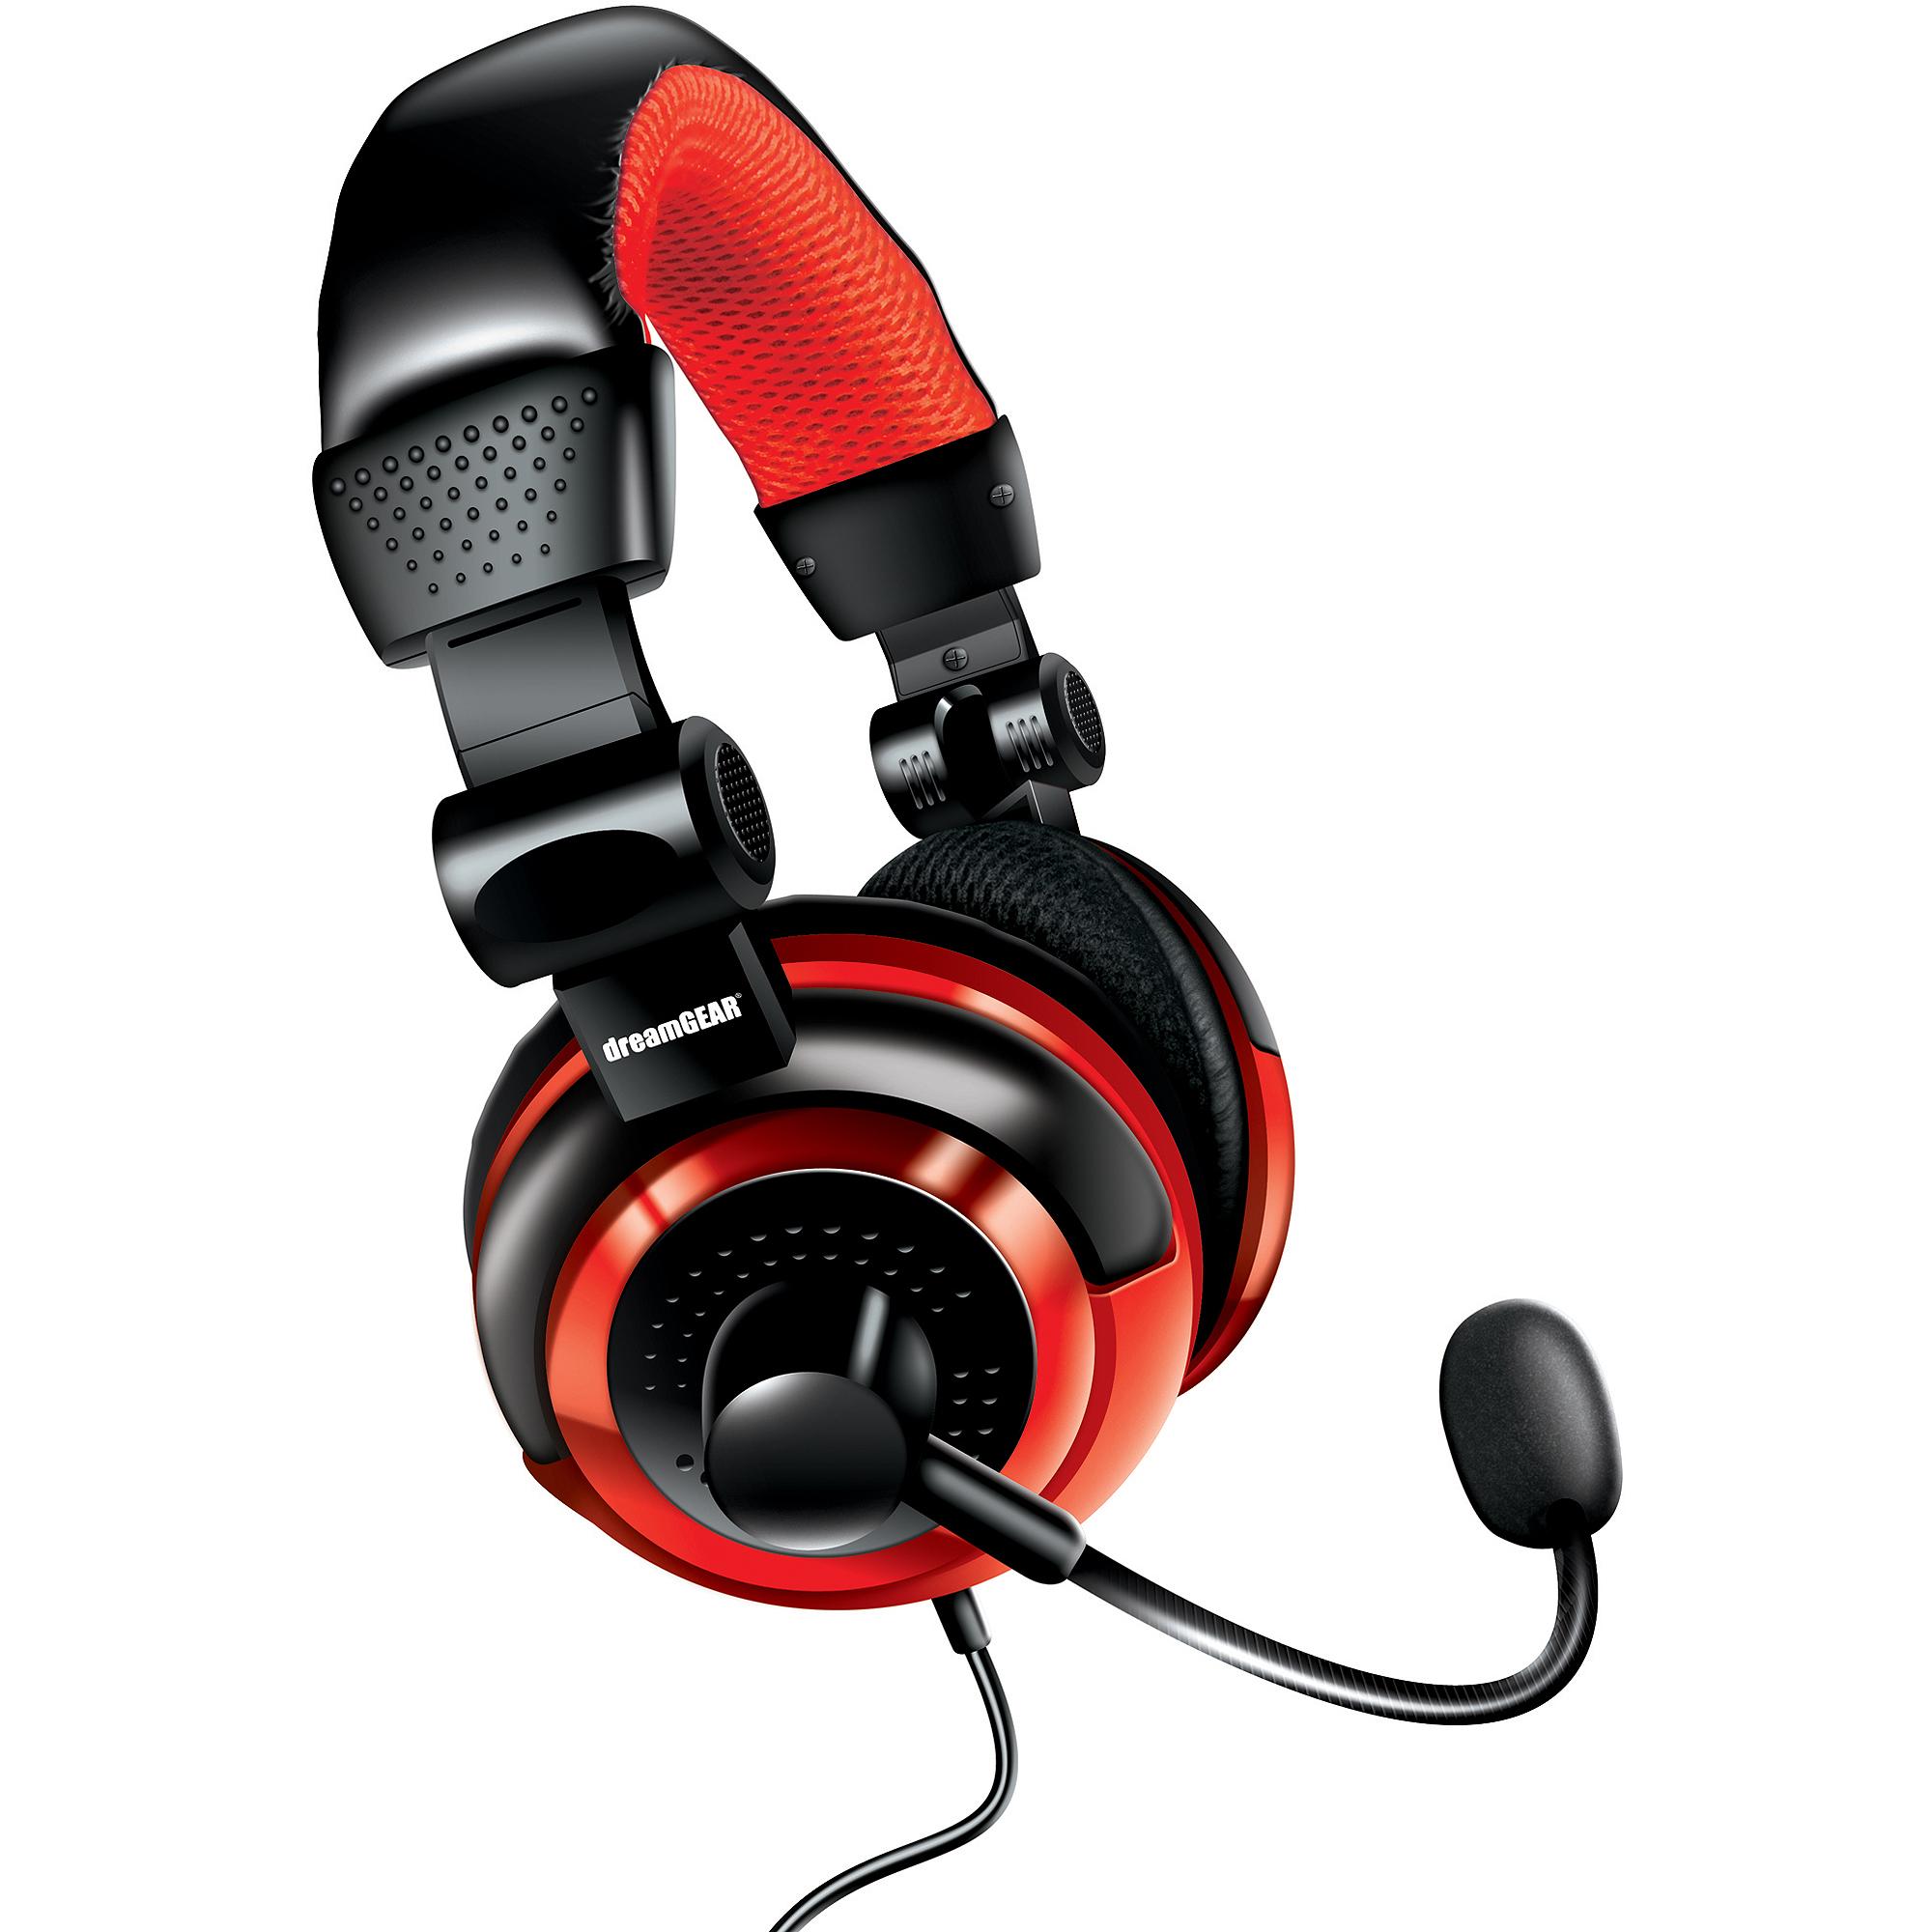 dreamGEAR DGUN-2571 Universal Elite Gaming Headset for PS4